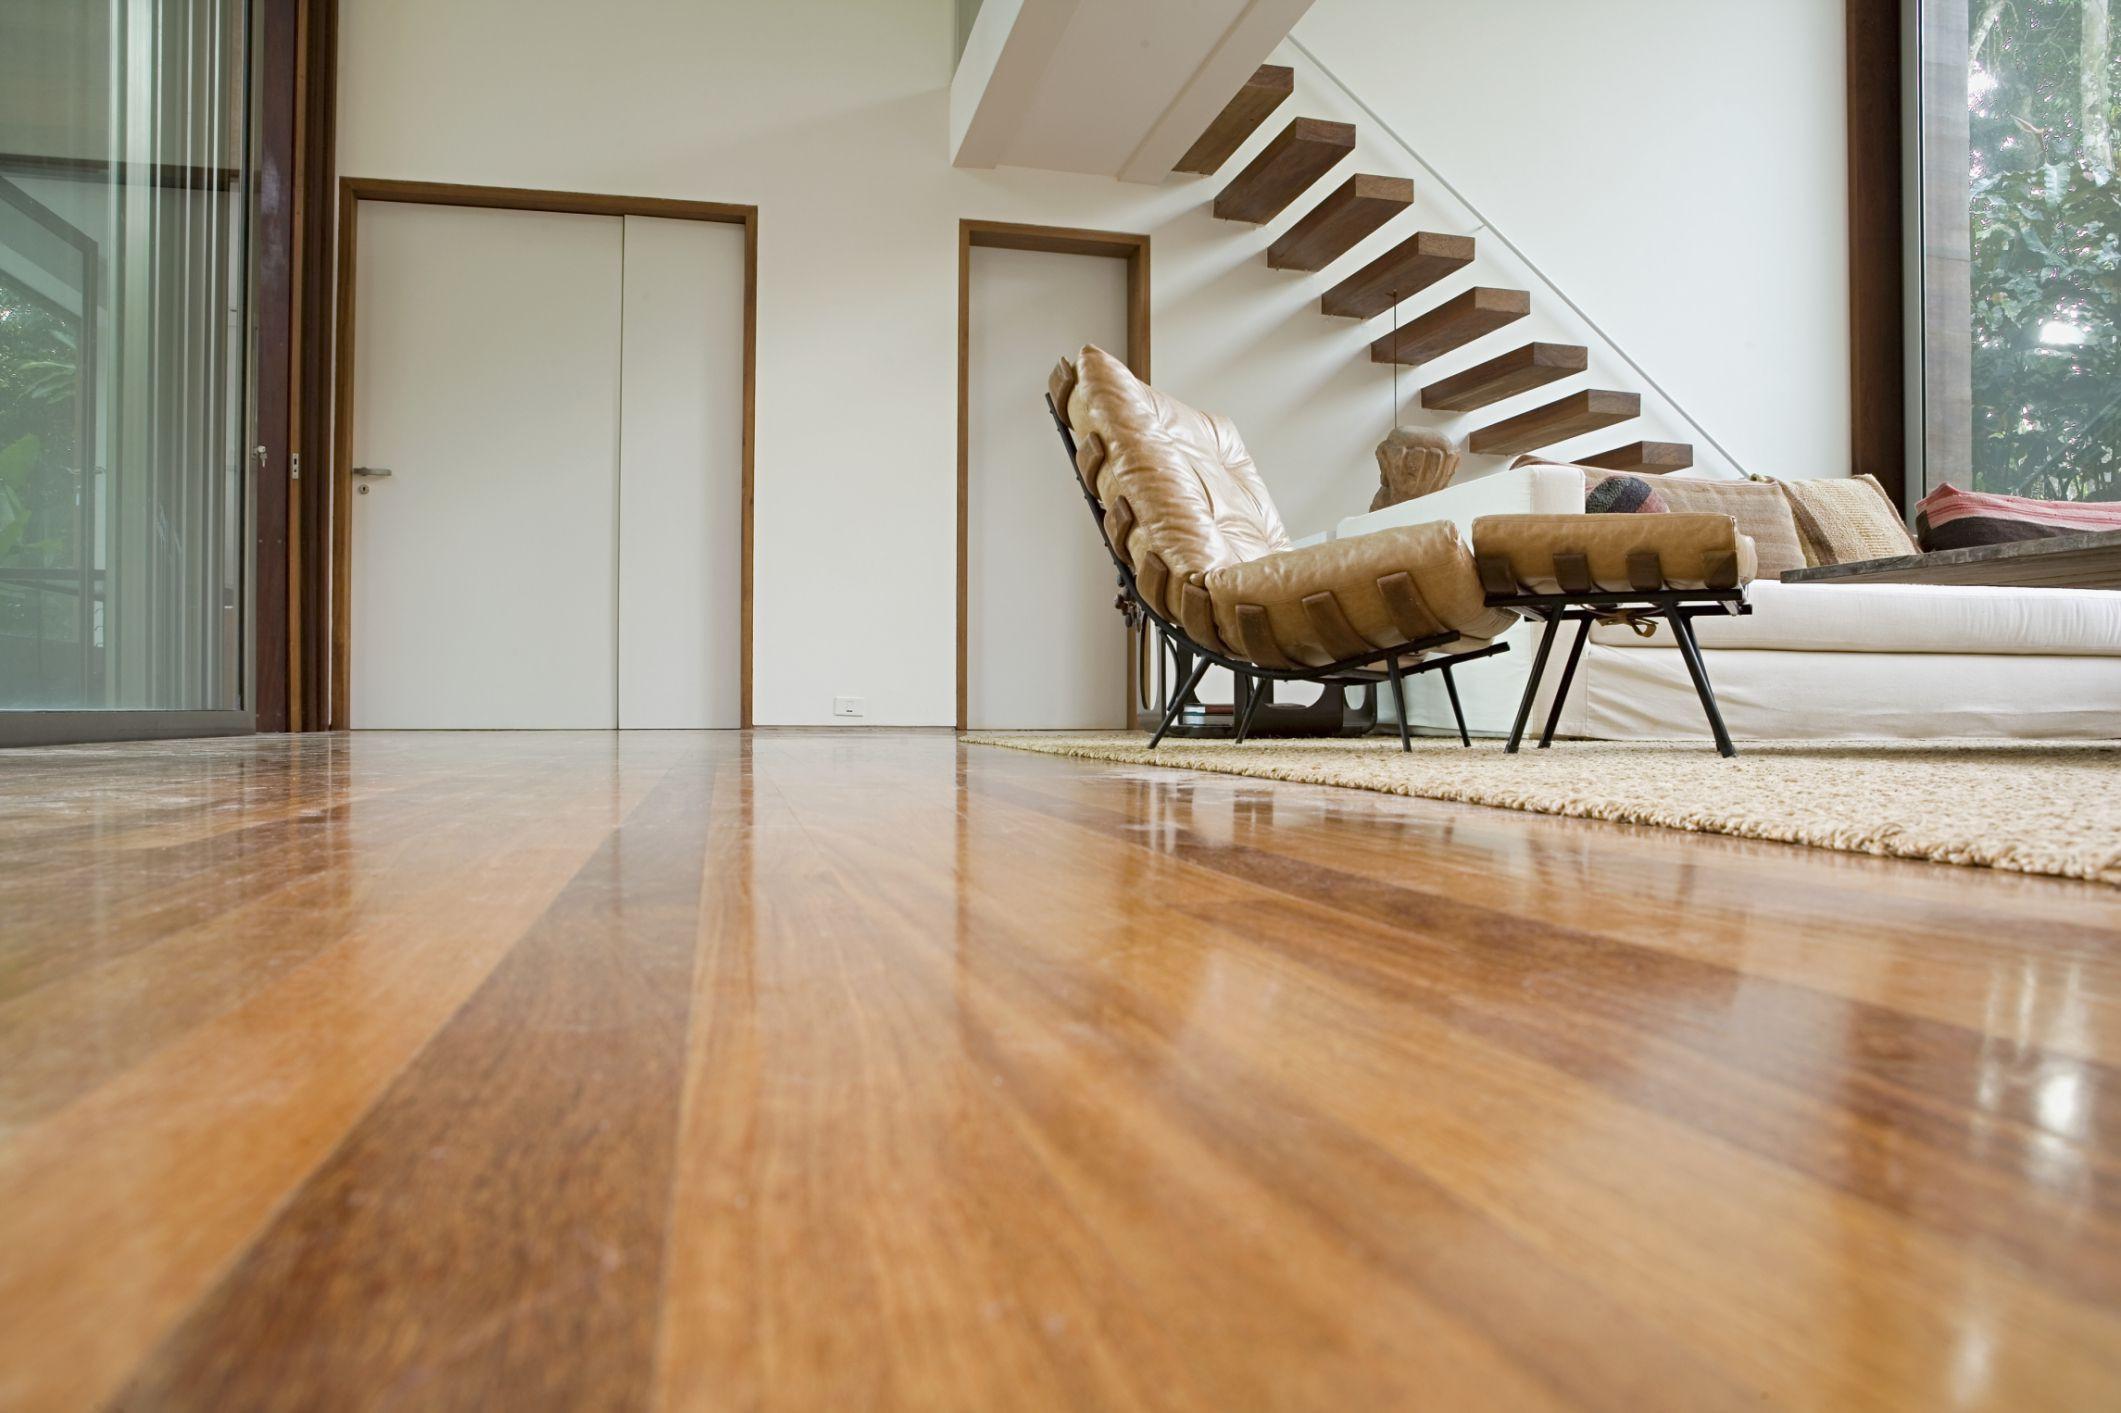 glue down engineered hardwood flooring vs floating of engineered wood flooring vs solid wood flooring with regard to 200571260 001 highres 56a49dec5f9b58b7d0d7dc1e